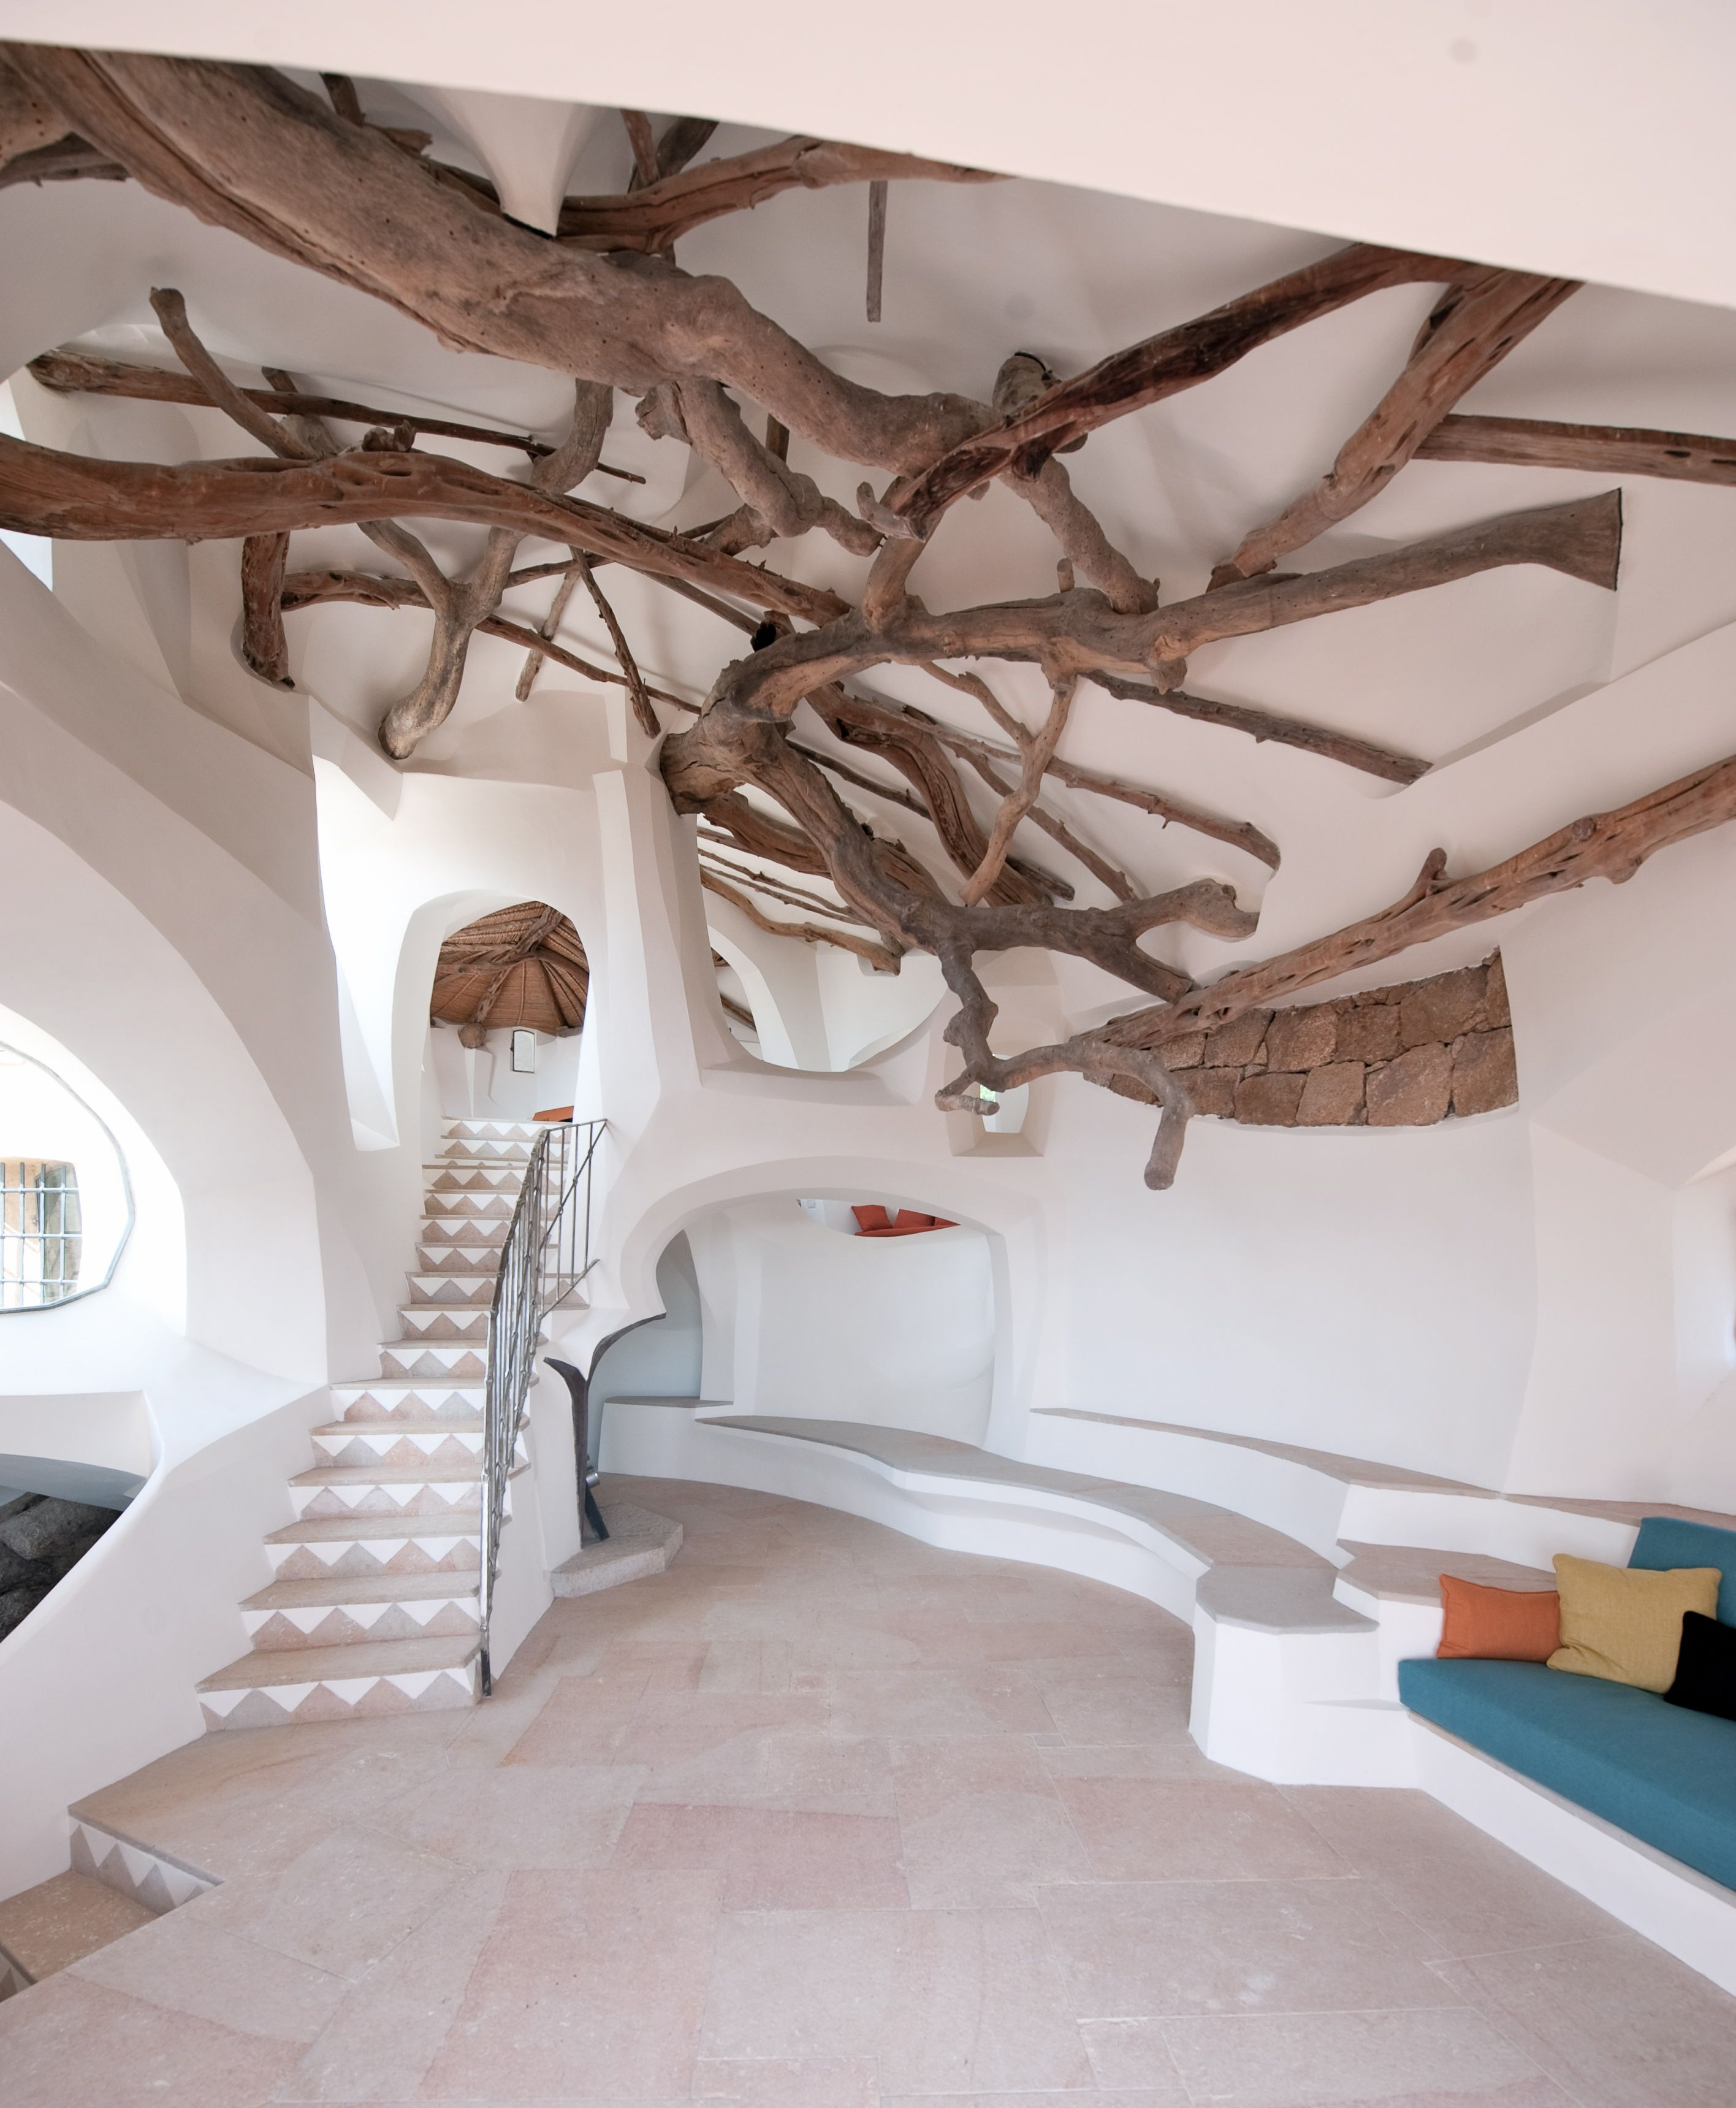 Villa due mari costa smeralda sardinia italy luxury for Four decor international srl